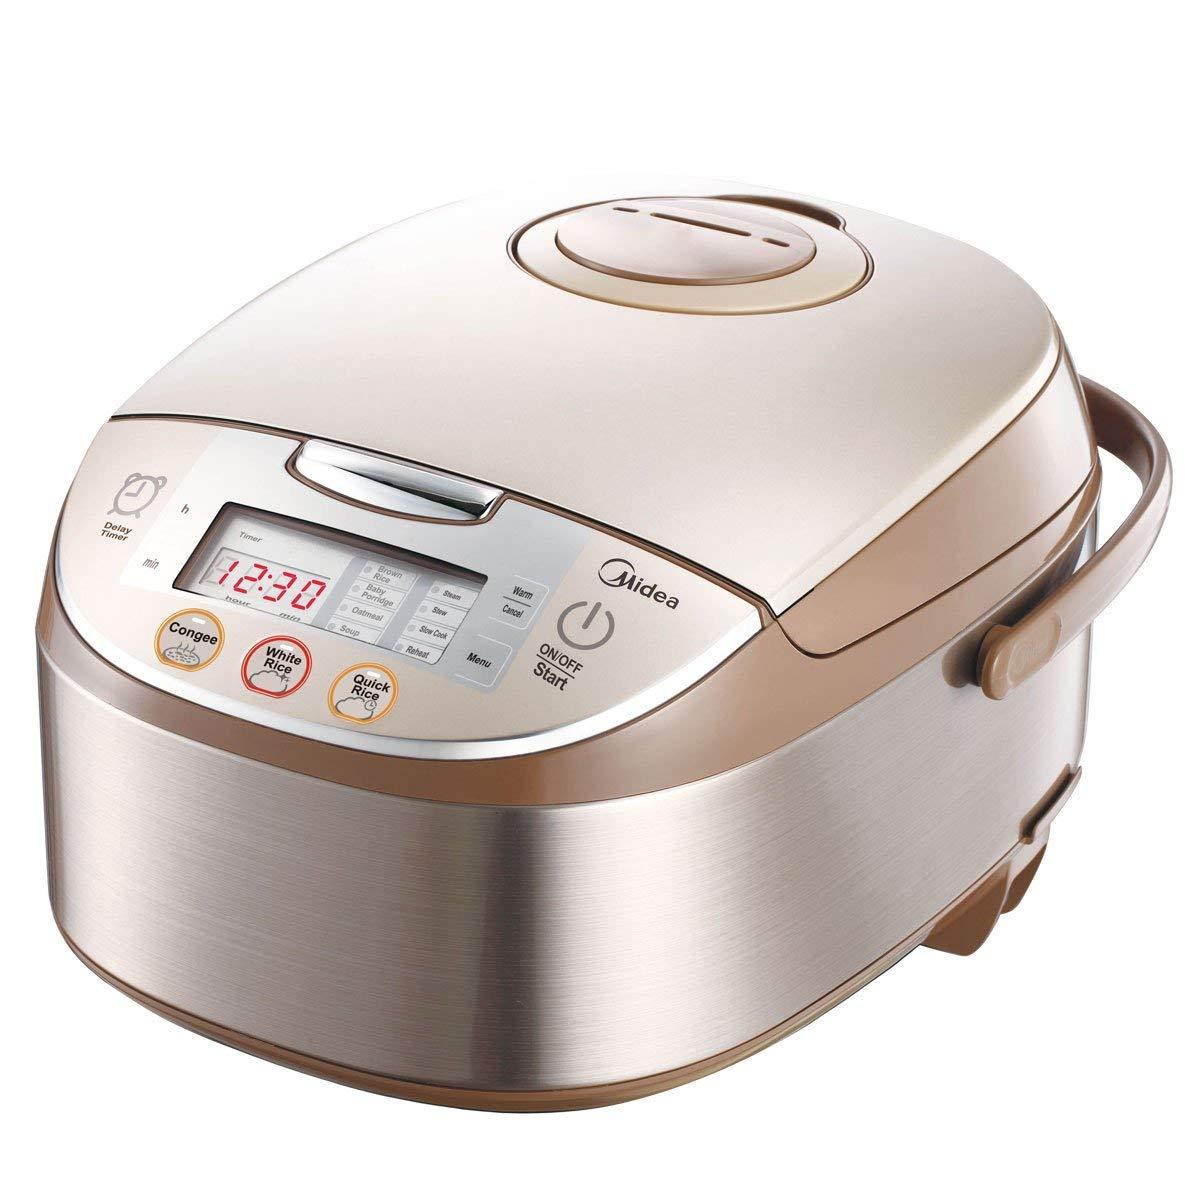 Midea Mb-fs5017 10 Cup Smart Multi-cooker/Rice Cooker/Maker & Steamer & Slow Cooker, Brushed Brown, 5Qt/875W (Renewed)